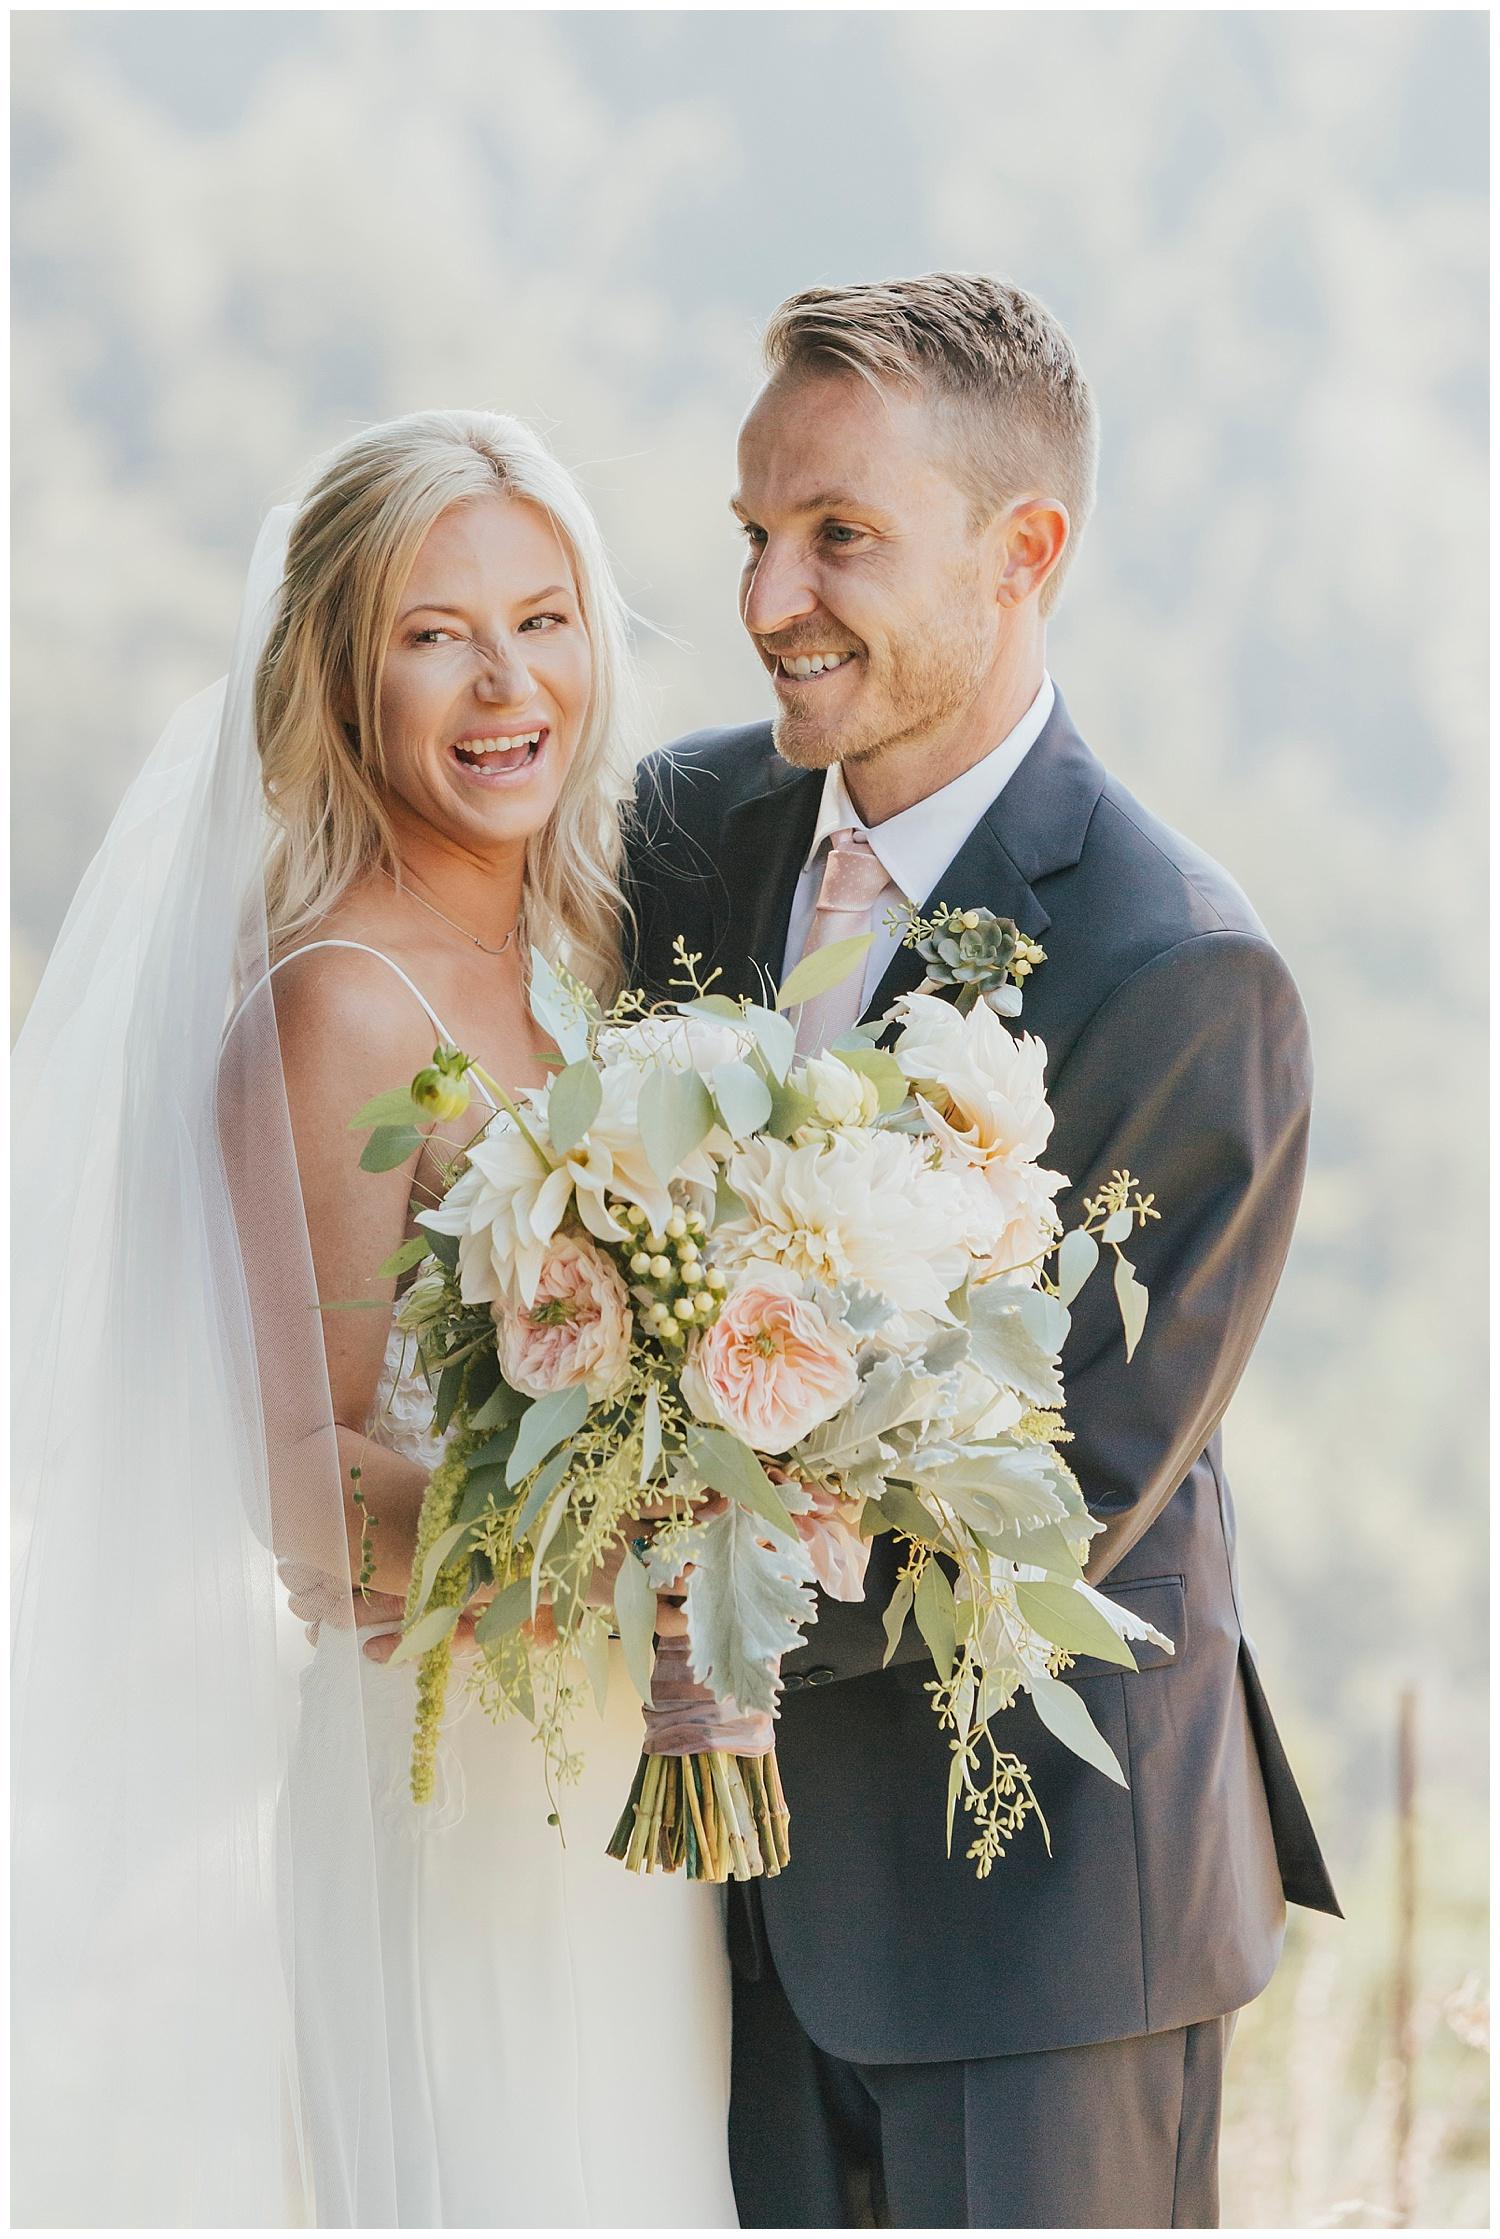 big-sur-wedding-bouquet-carol-oliva-photography.jpg